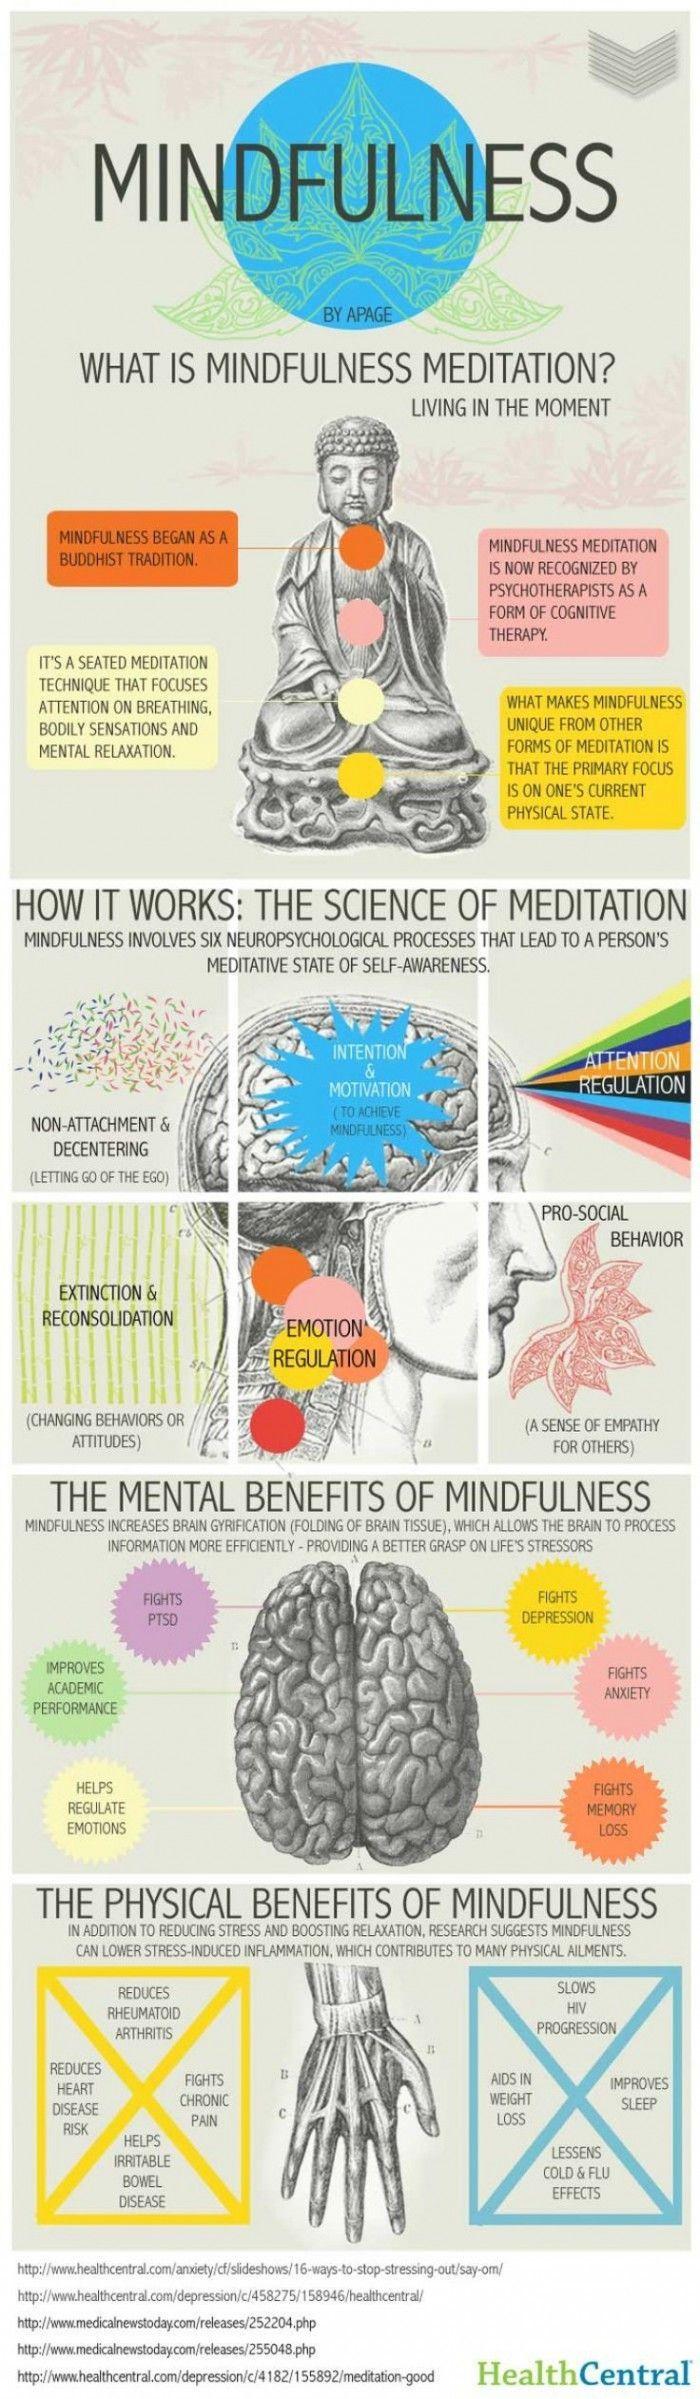 Benefits of Mindfulness (Meditation)